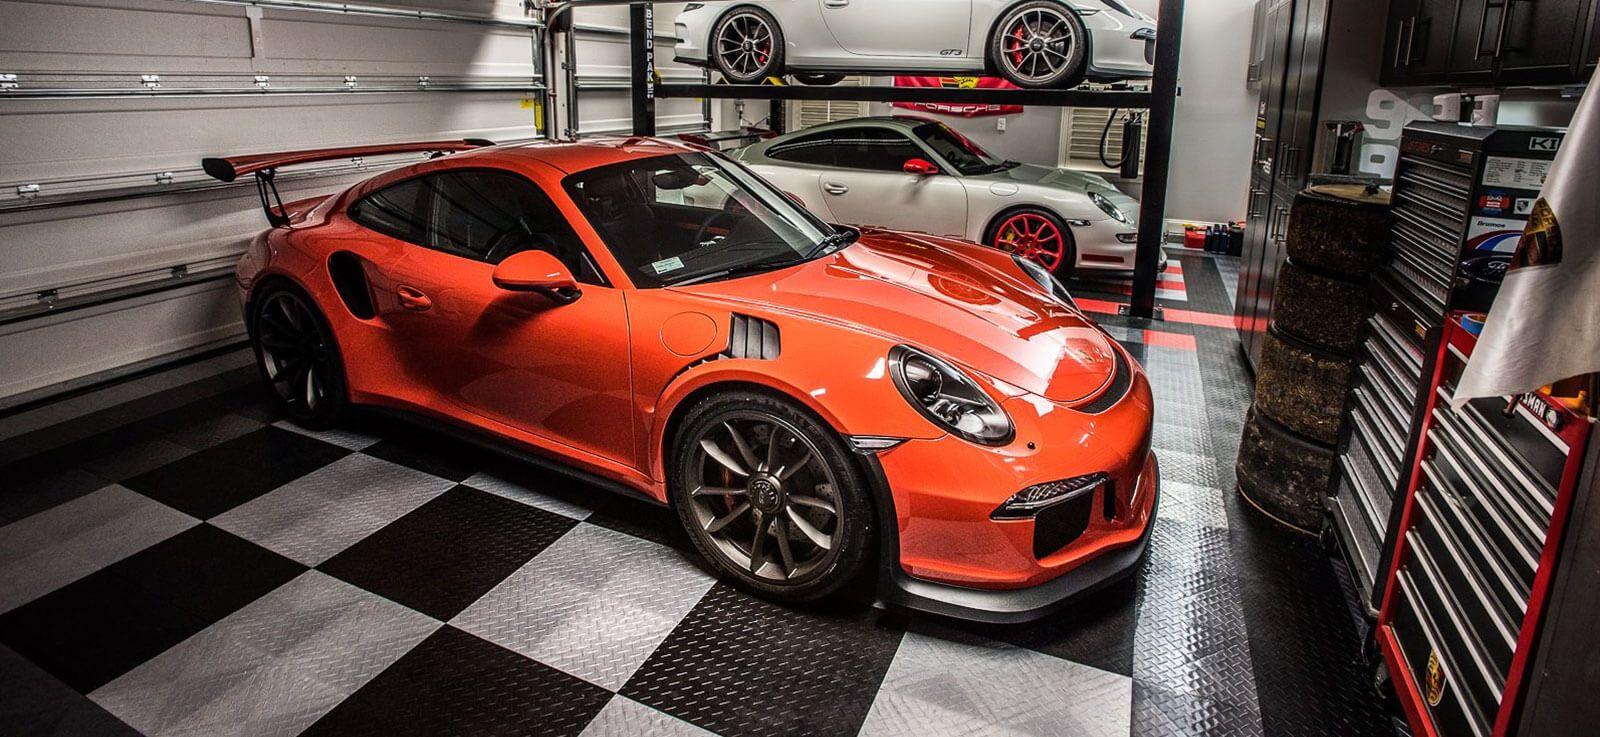 cool epoxy or tile garage flooring